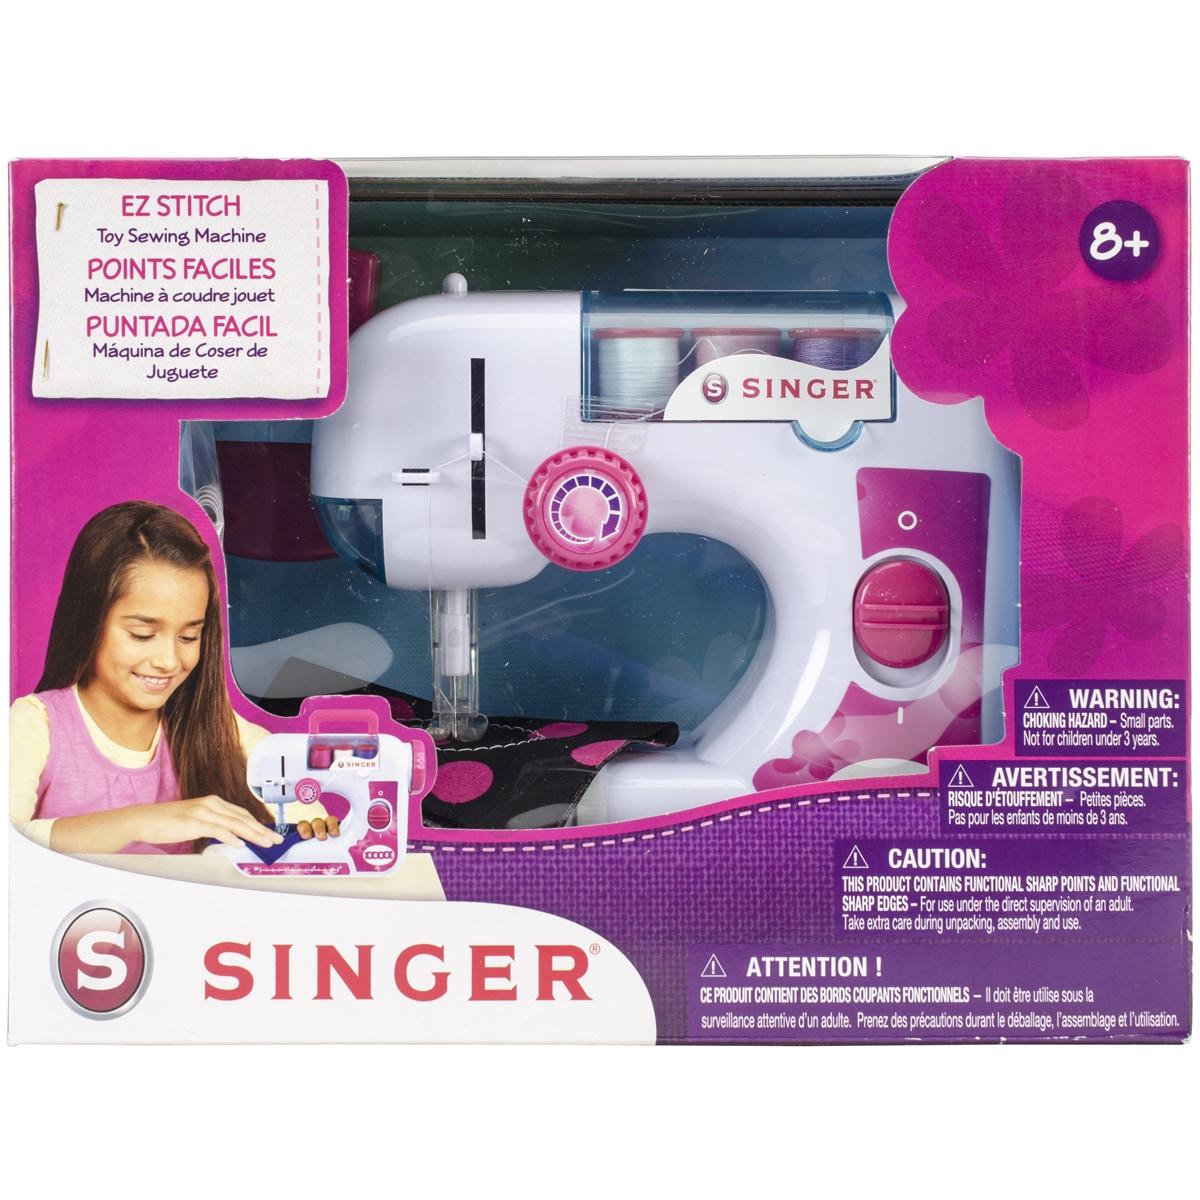 SINGER SEWING CO. A2213 EZ-Stitch Chainstitch Sewing Mach...